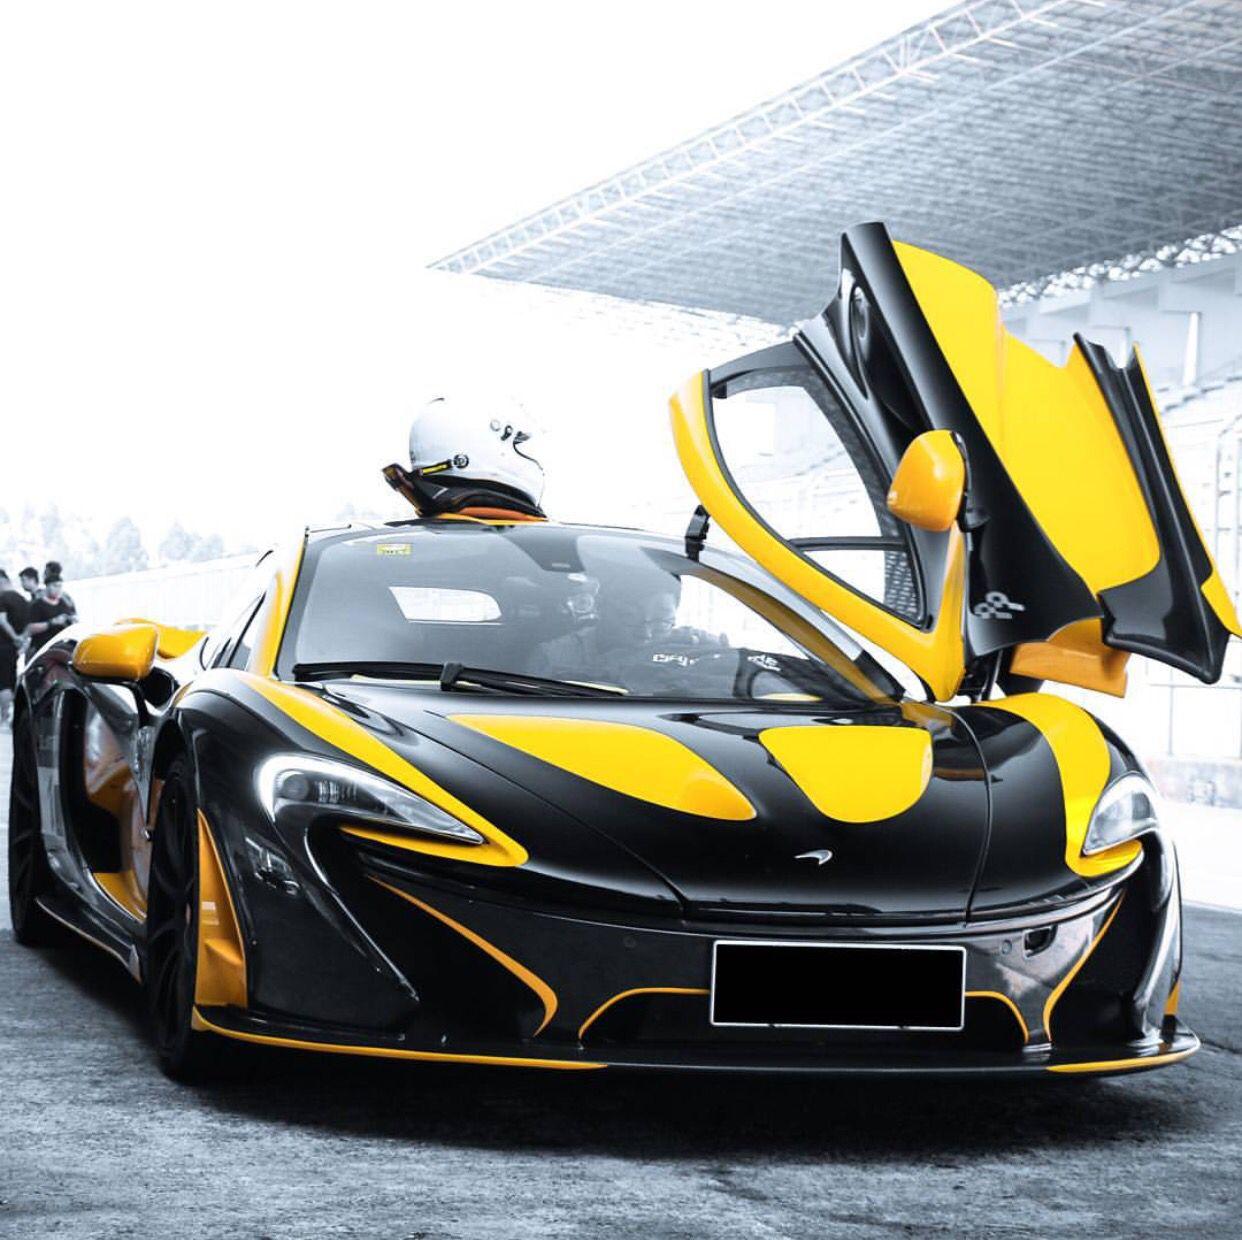 McLaren P1 Painted In Black W/ MSO Volcano Yellow Accents